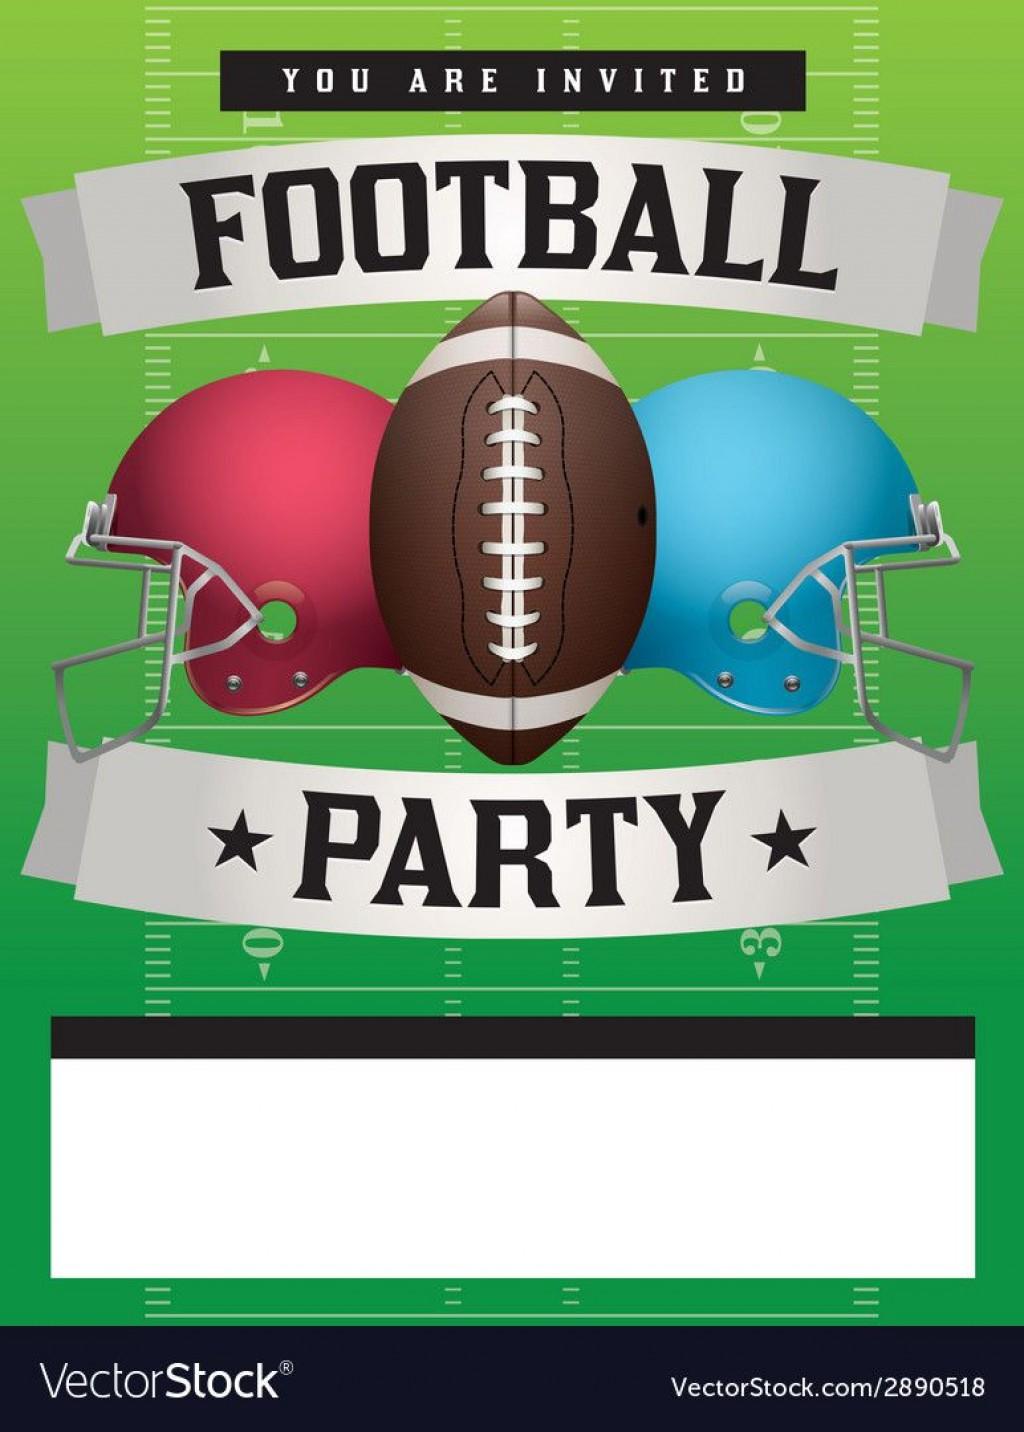 010 Impressive Football Flyer Template Free Design  Download Flag PartyLarge